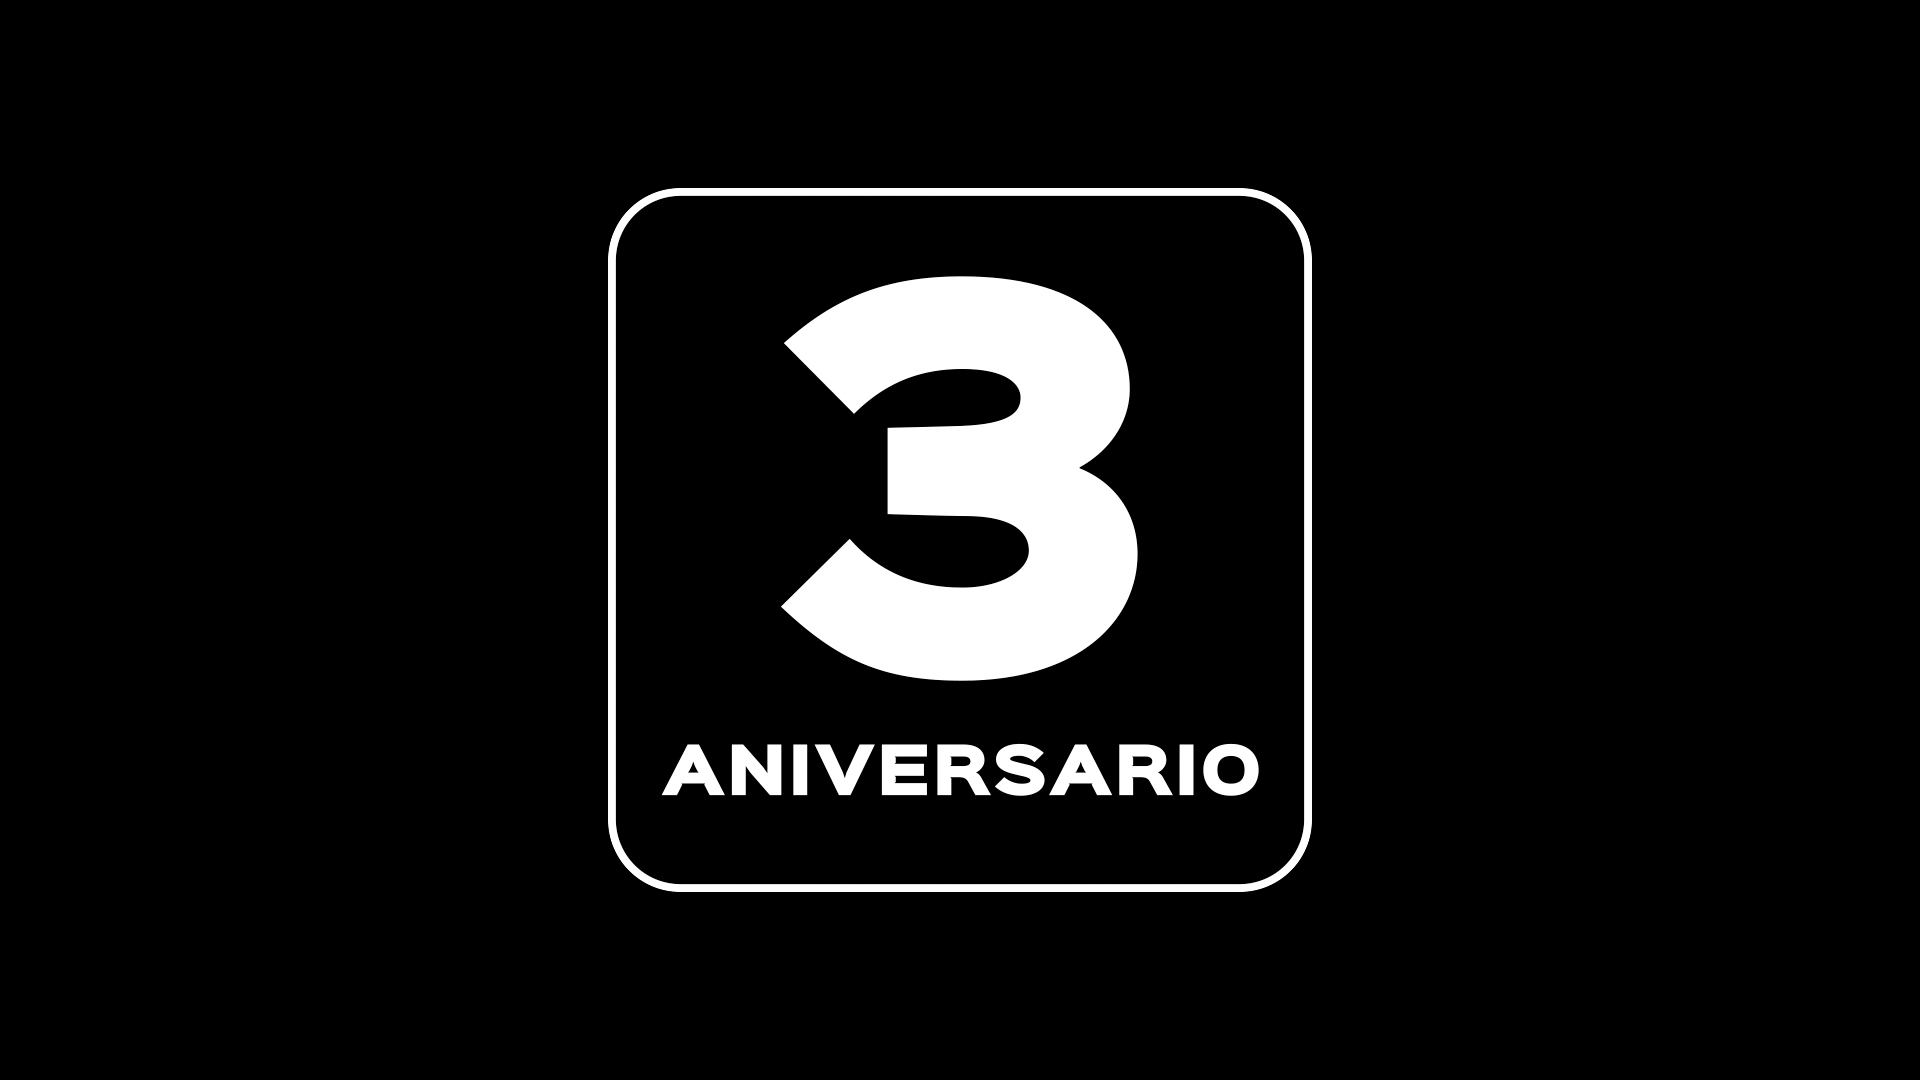 3 aniversario Ópera Café Oviedo - video - víctor merino _ video marketing online